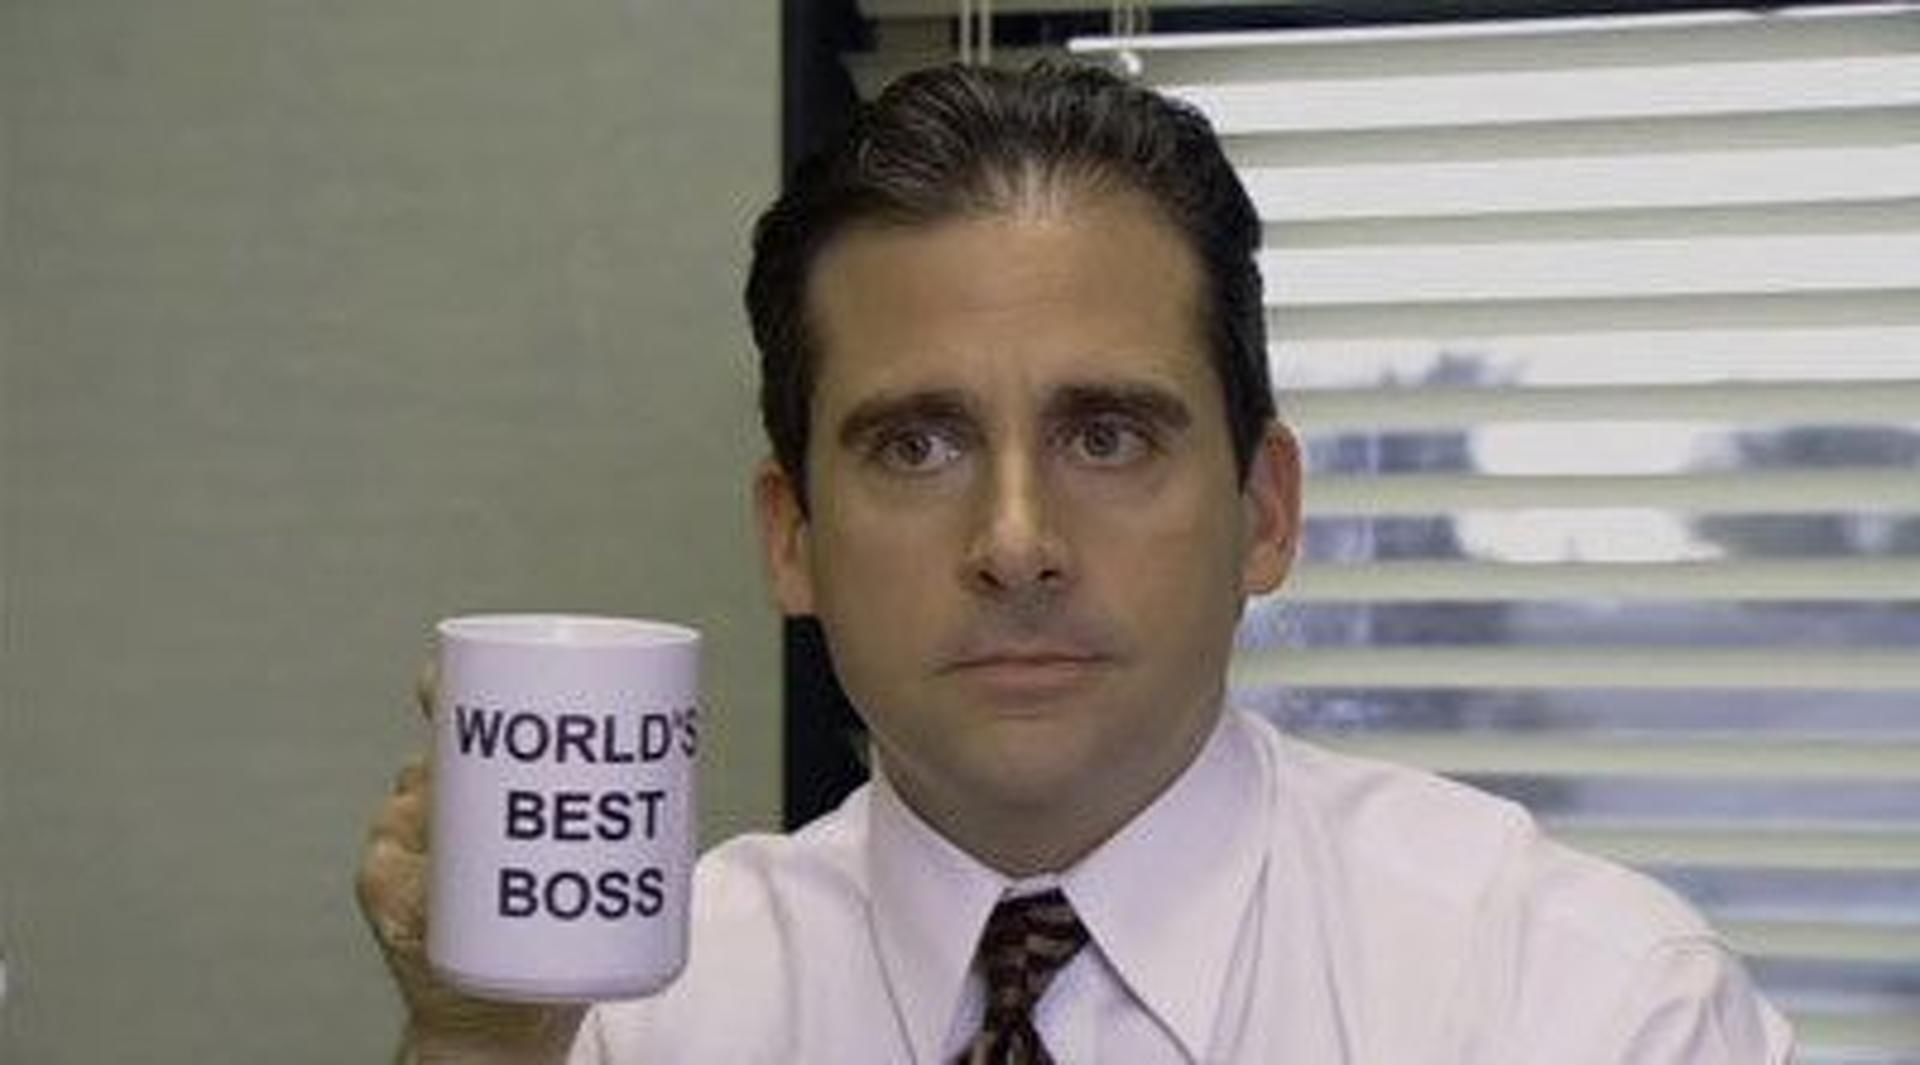 The Office (US) (S01E04): The Alliance Summary - Season 1 Episode 4